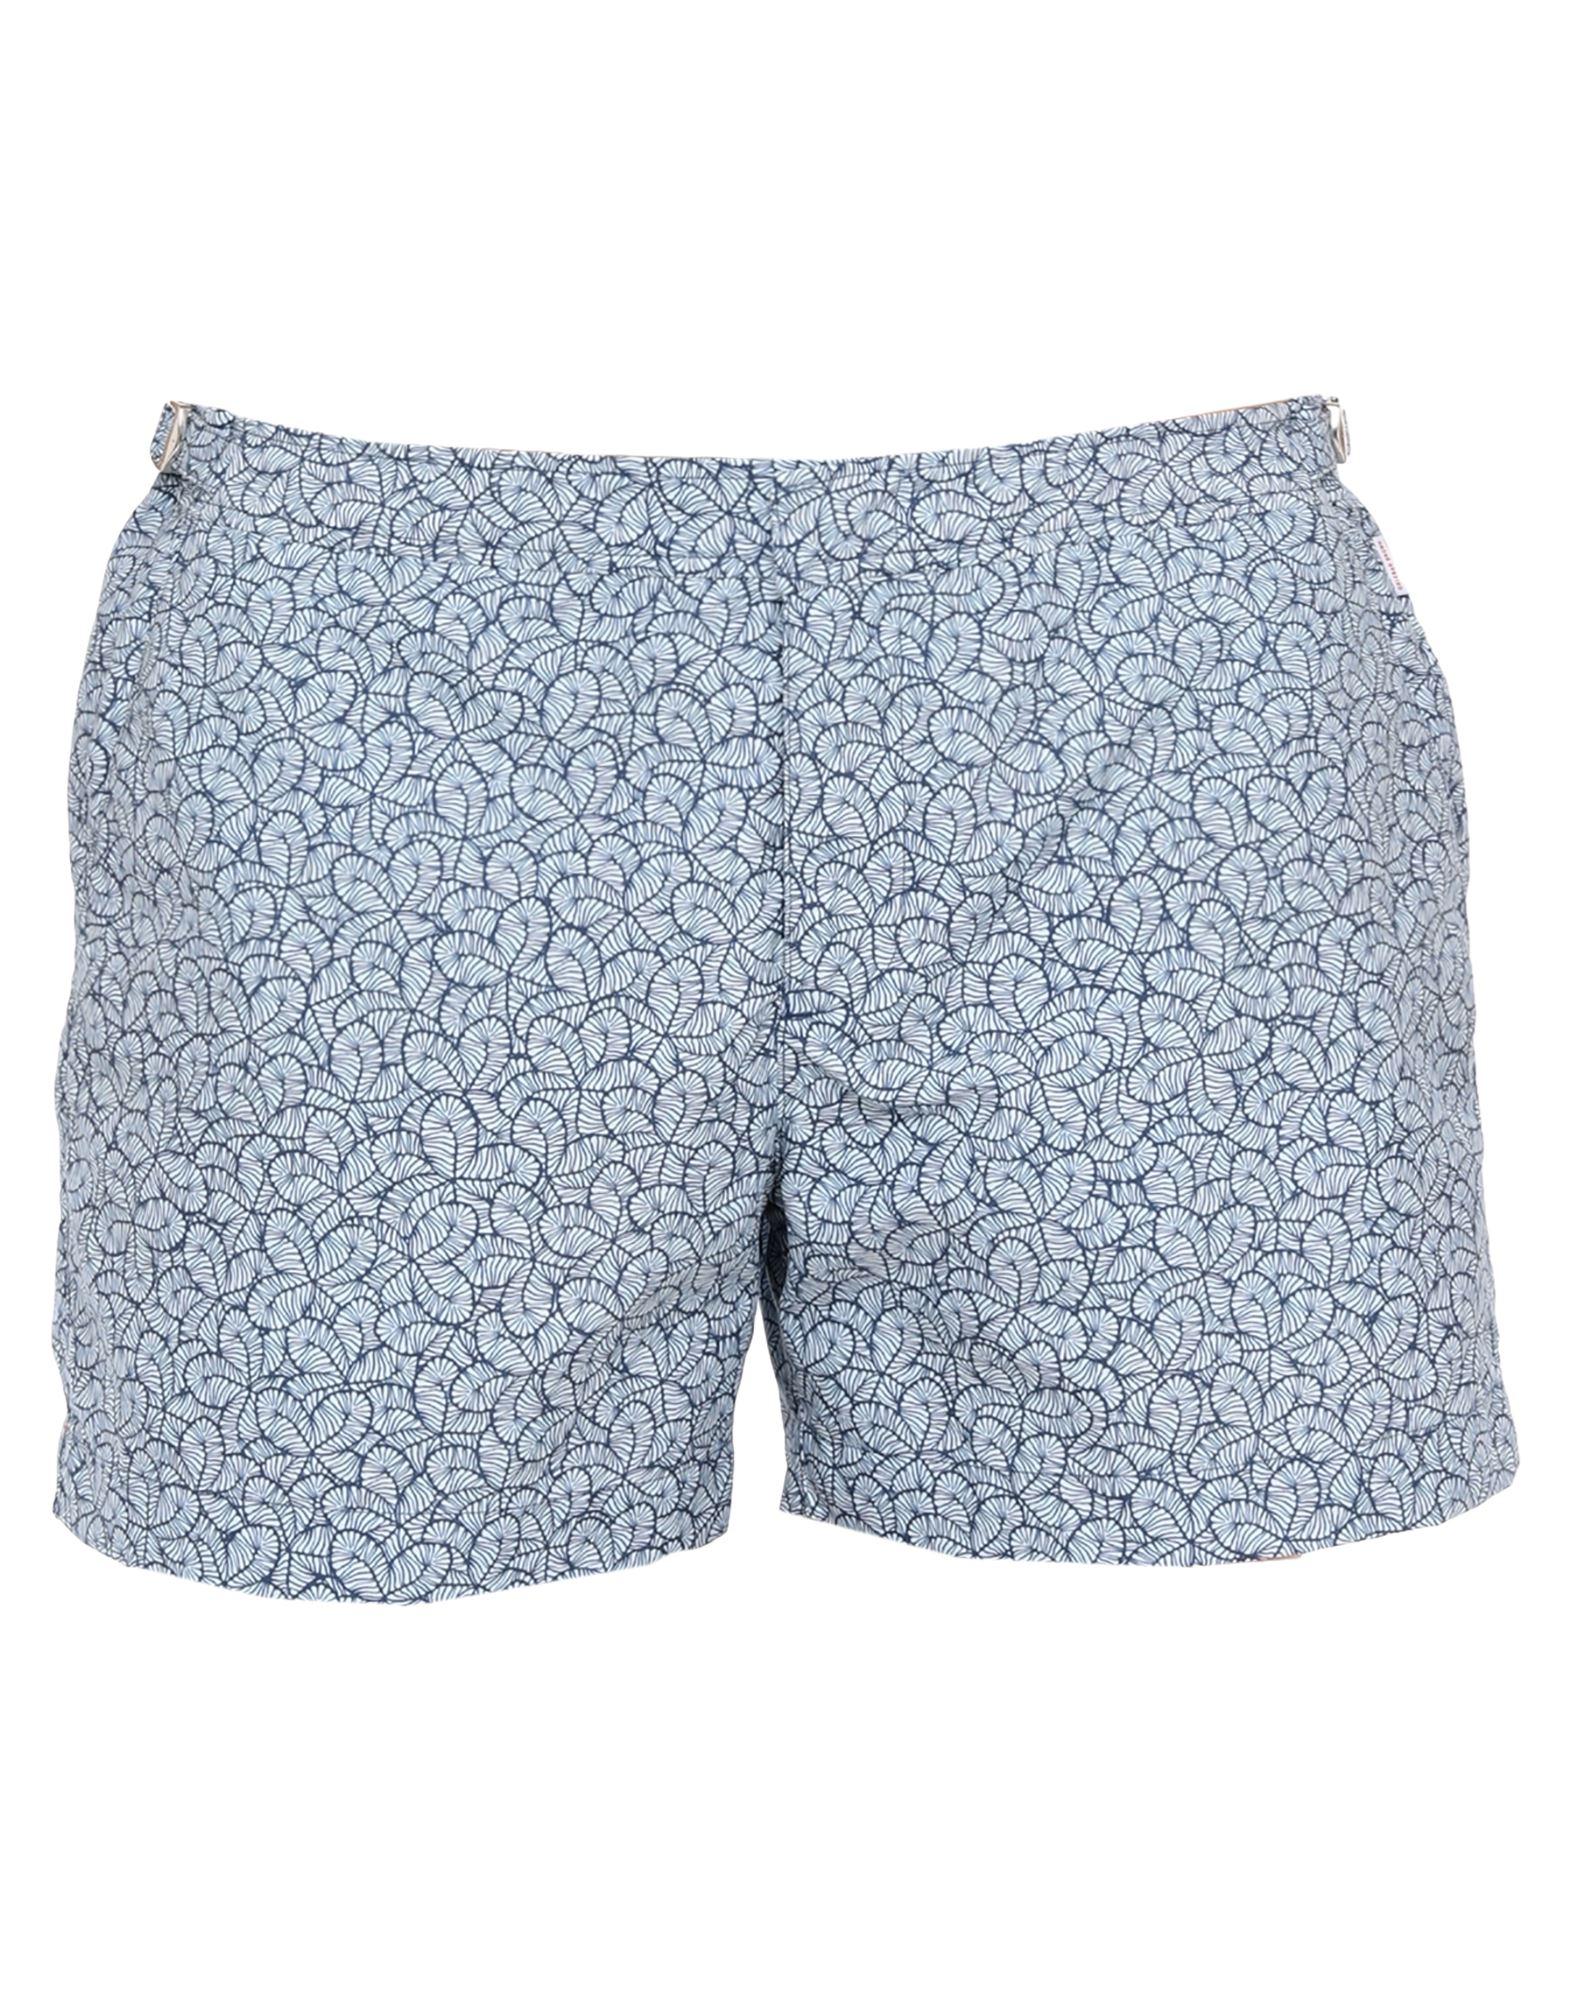 ORLEBAR BROWN Шорты для плавания orlebar brown пляжные брюки и шорты